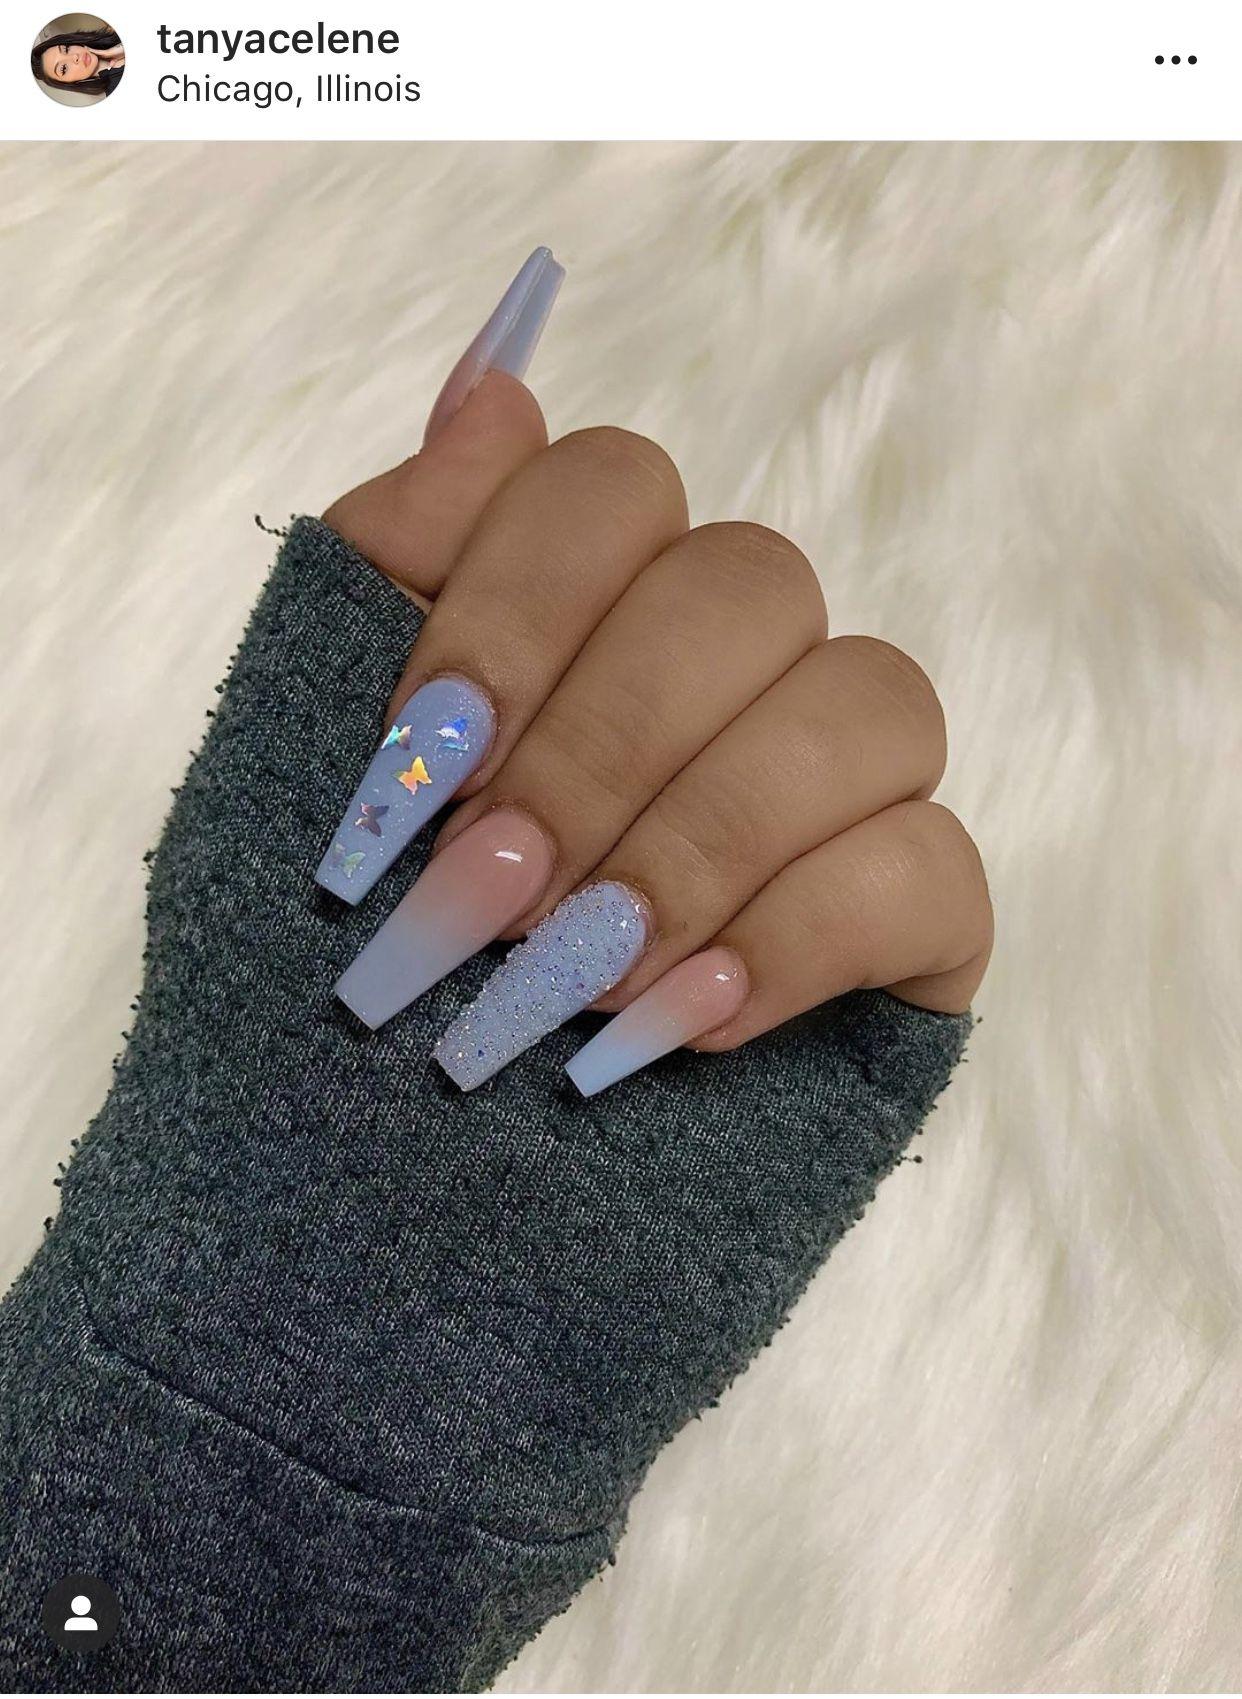 Tanyacelene On Instagram In 2020 Best Acrylic Nails Blue Acrylic Nails Long Acrylic Nails